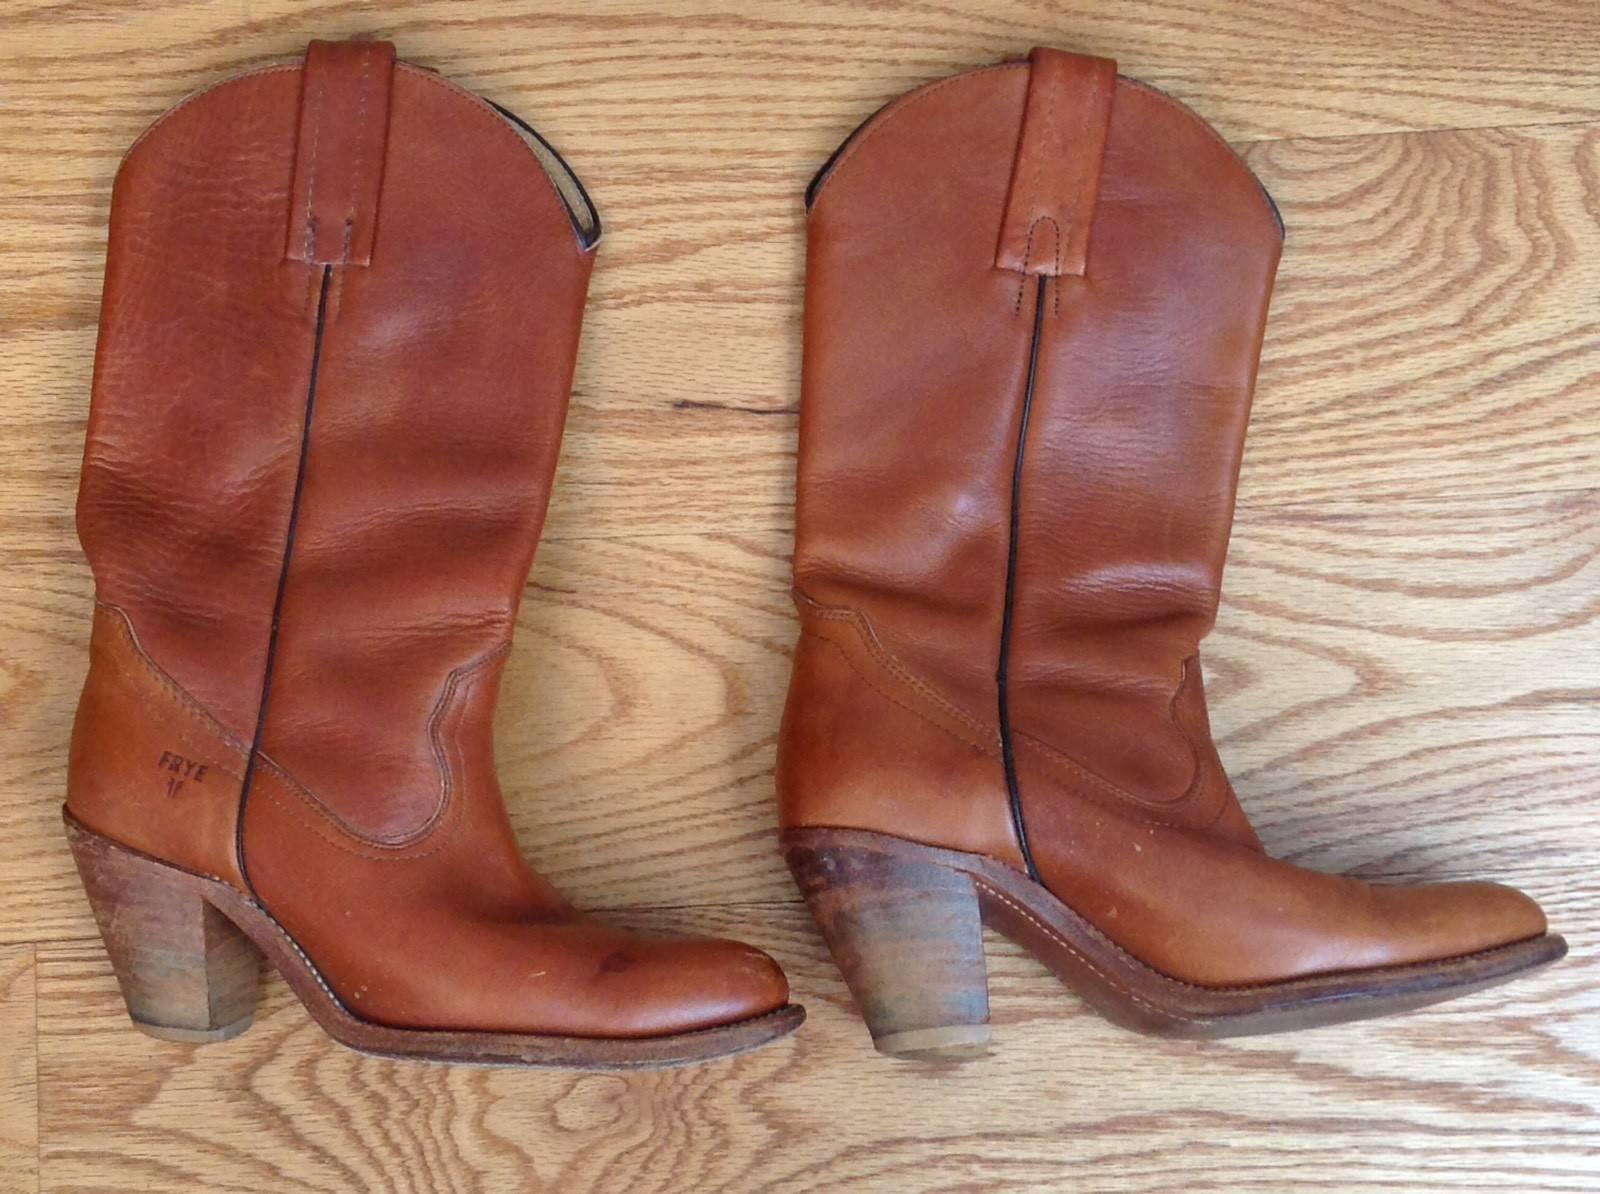 Vintage FRYE Cowboy BOOTS Brown 6175 ALL LEATHER # 6175 Brown SIZE 6 1/2 B Tan Cognac HIGH 883b44